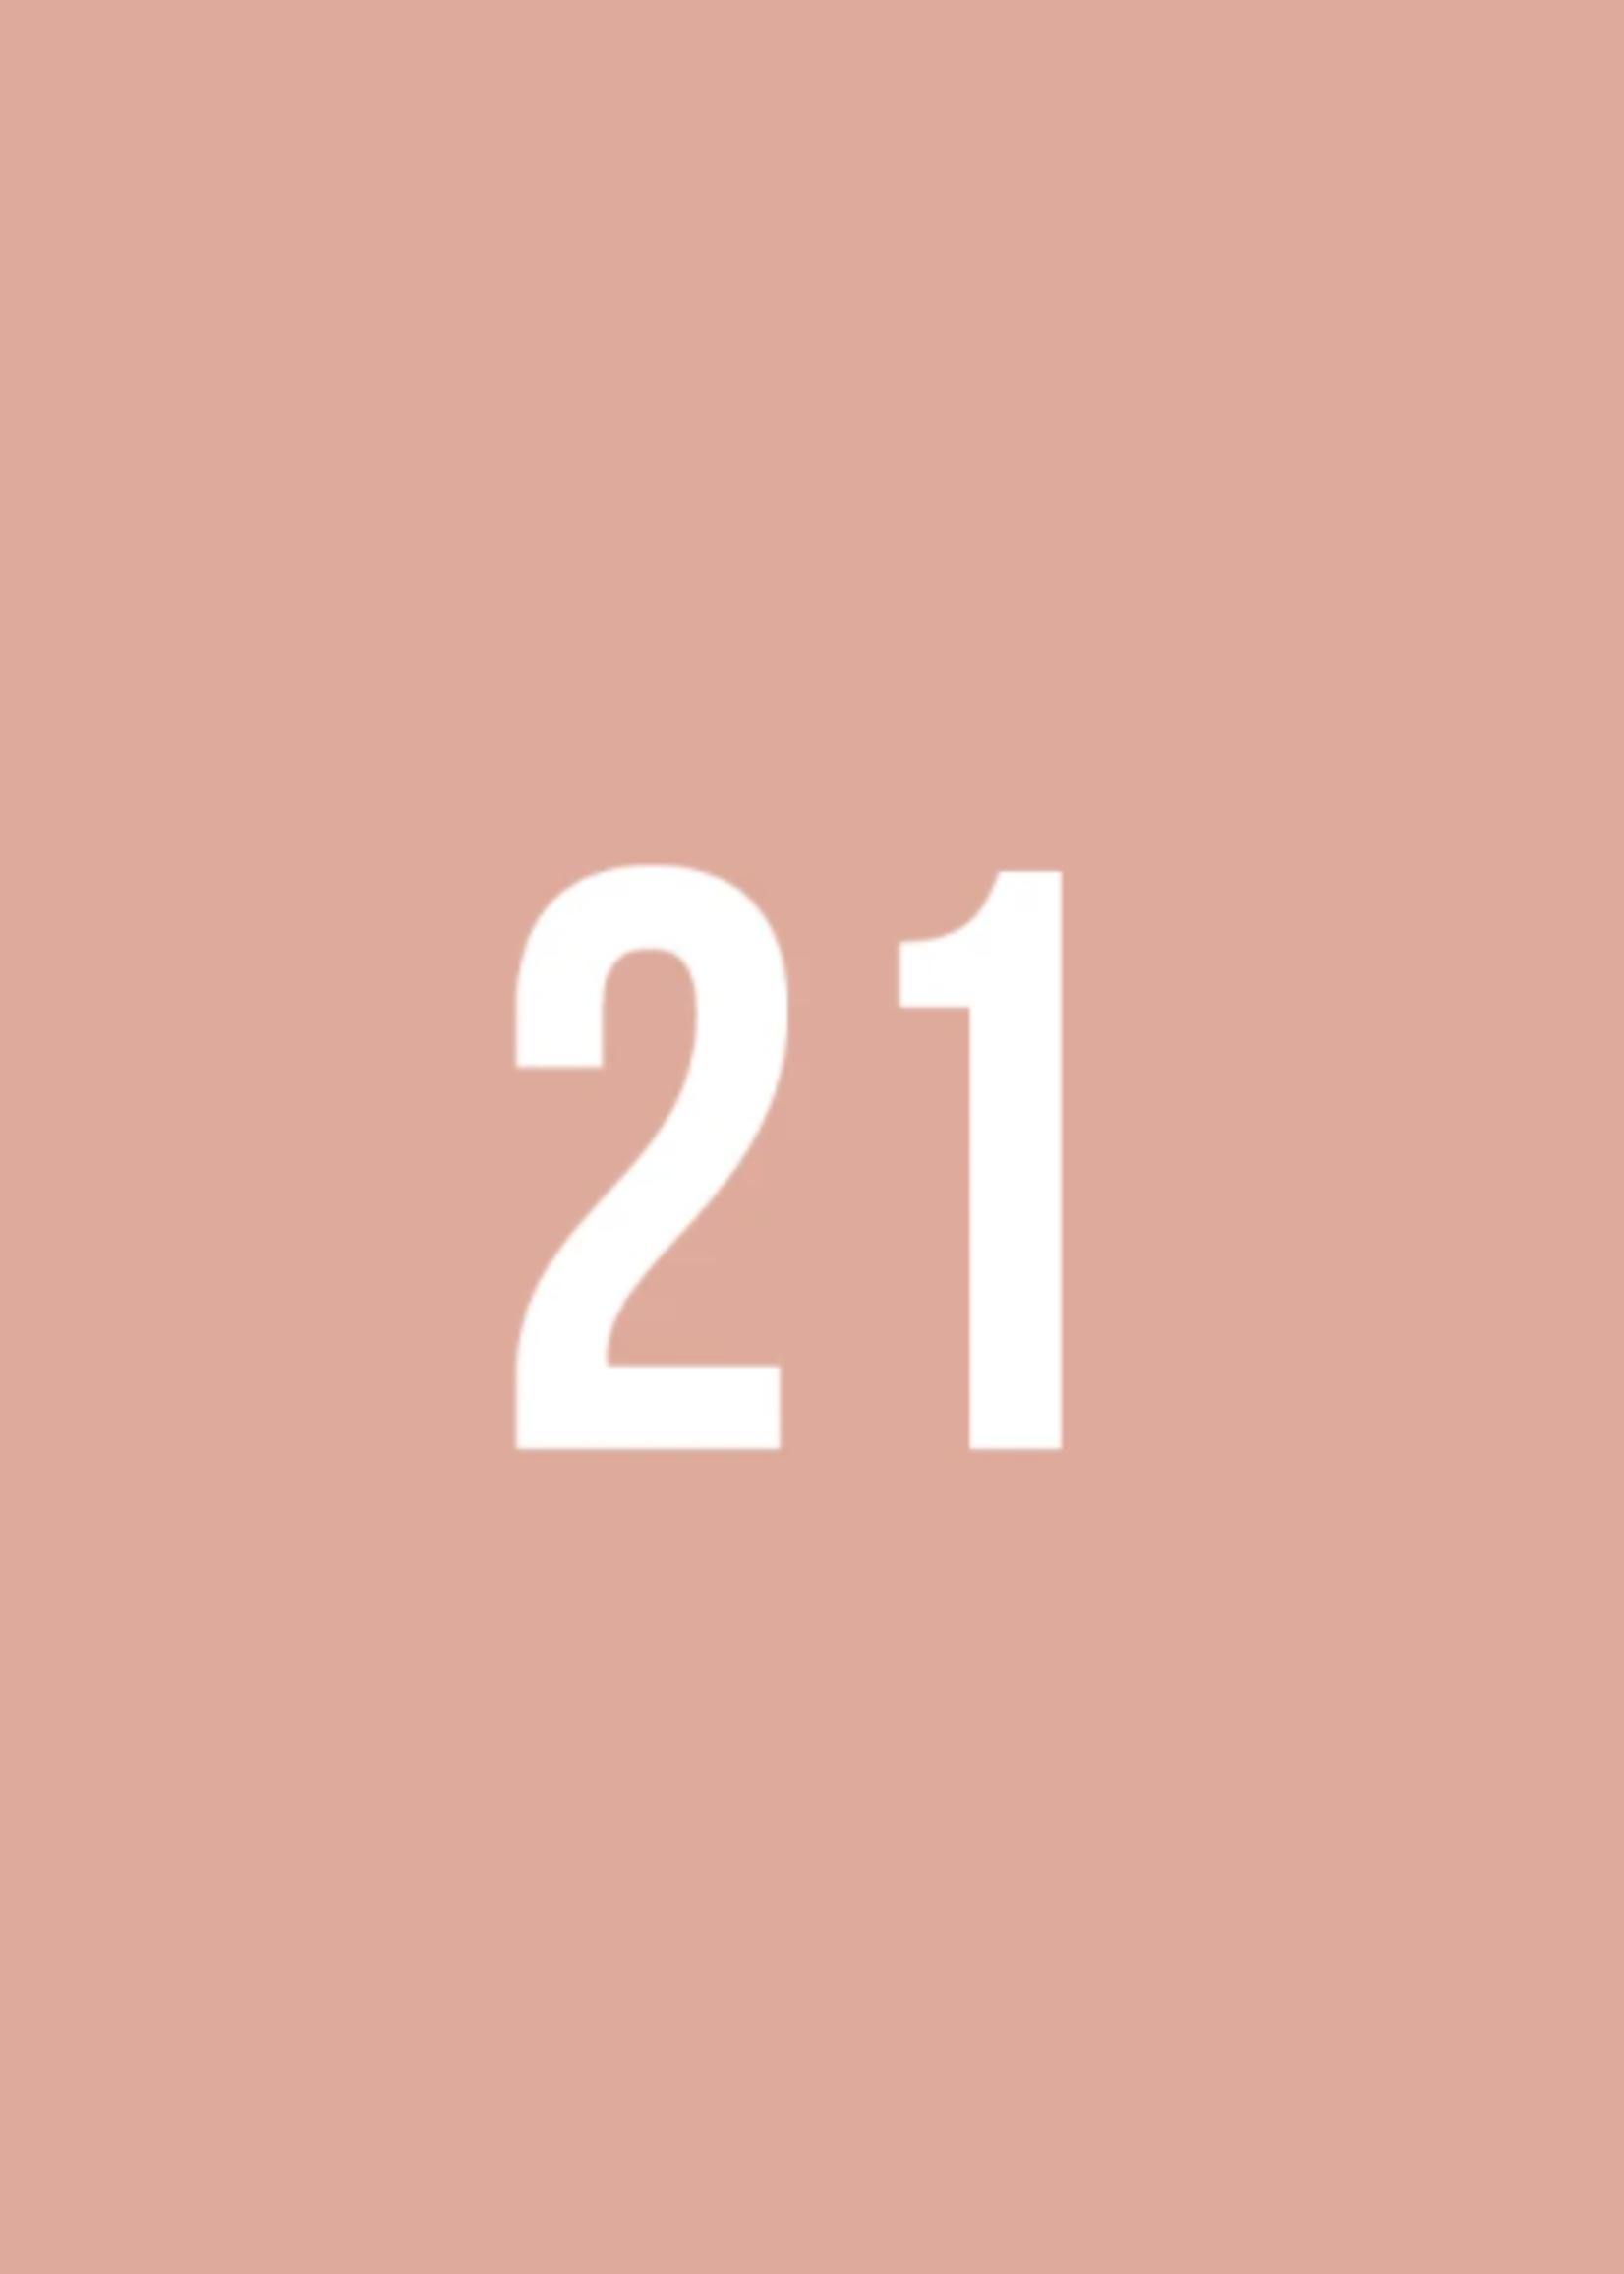 About Blue Coupon100cm UNI 21 Dusty Pink